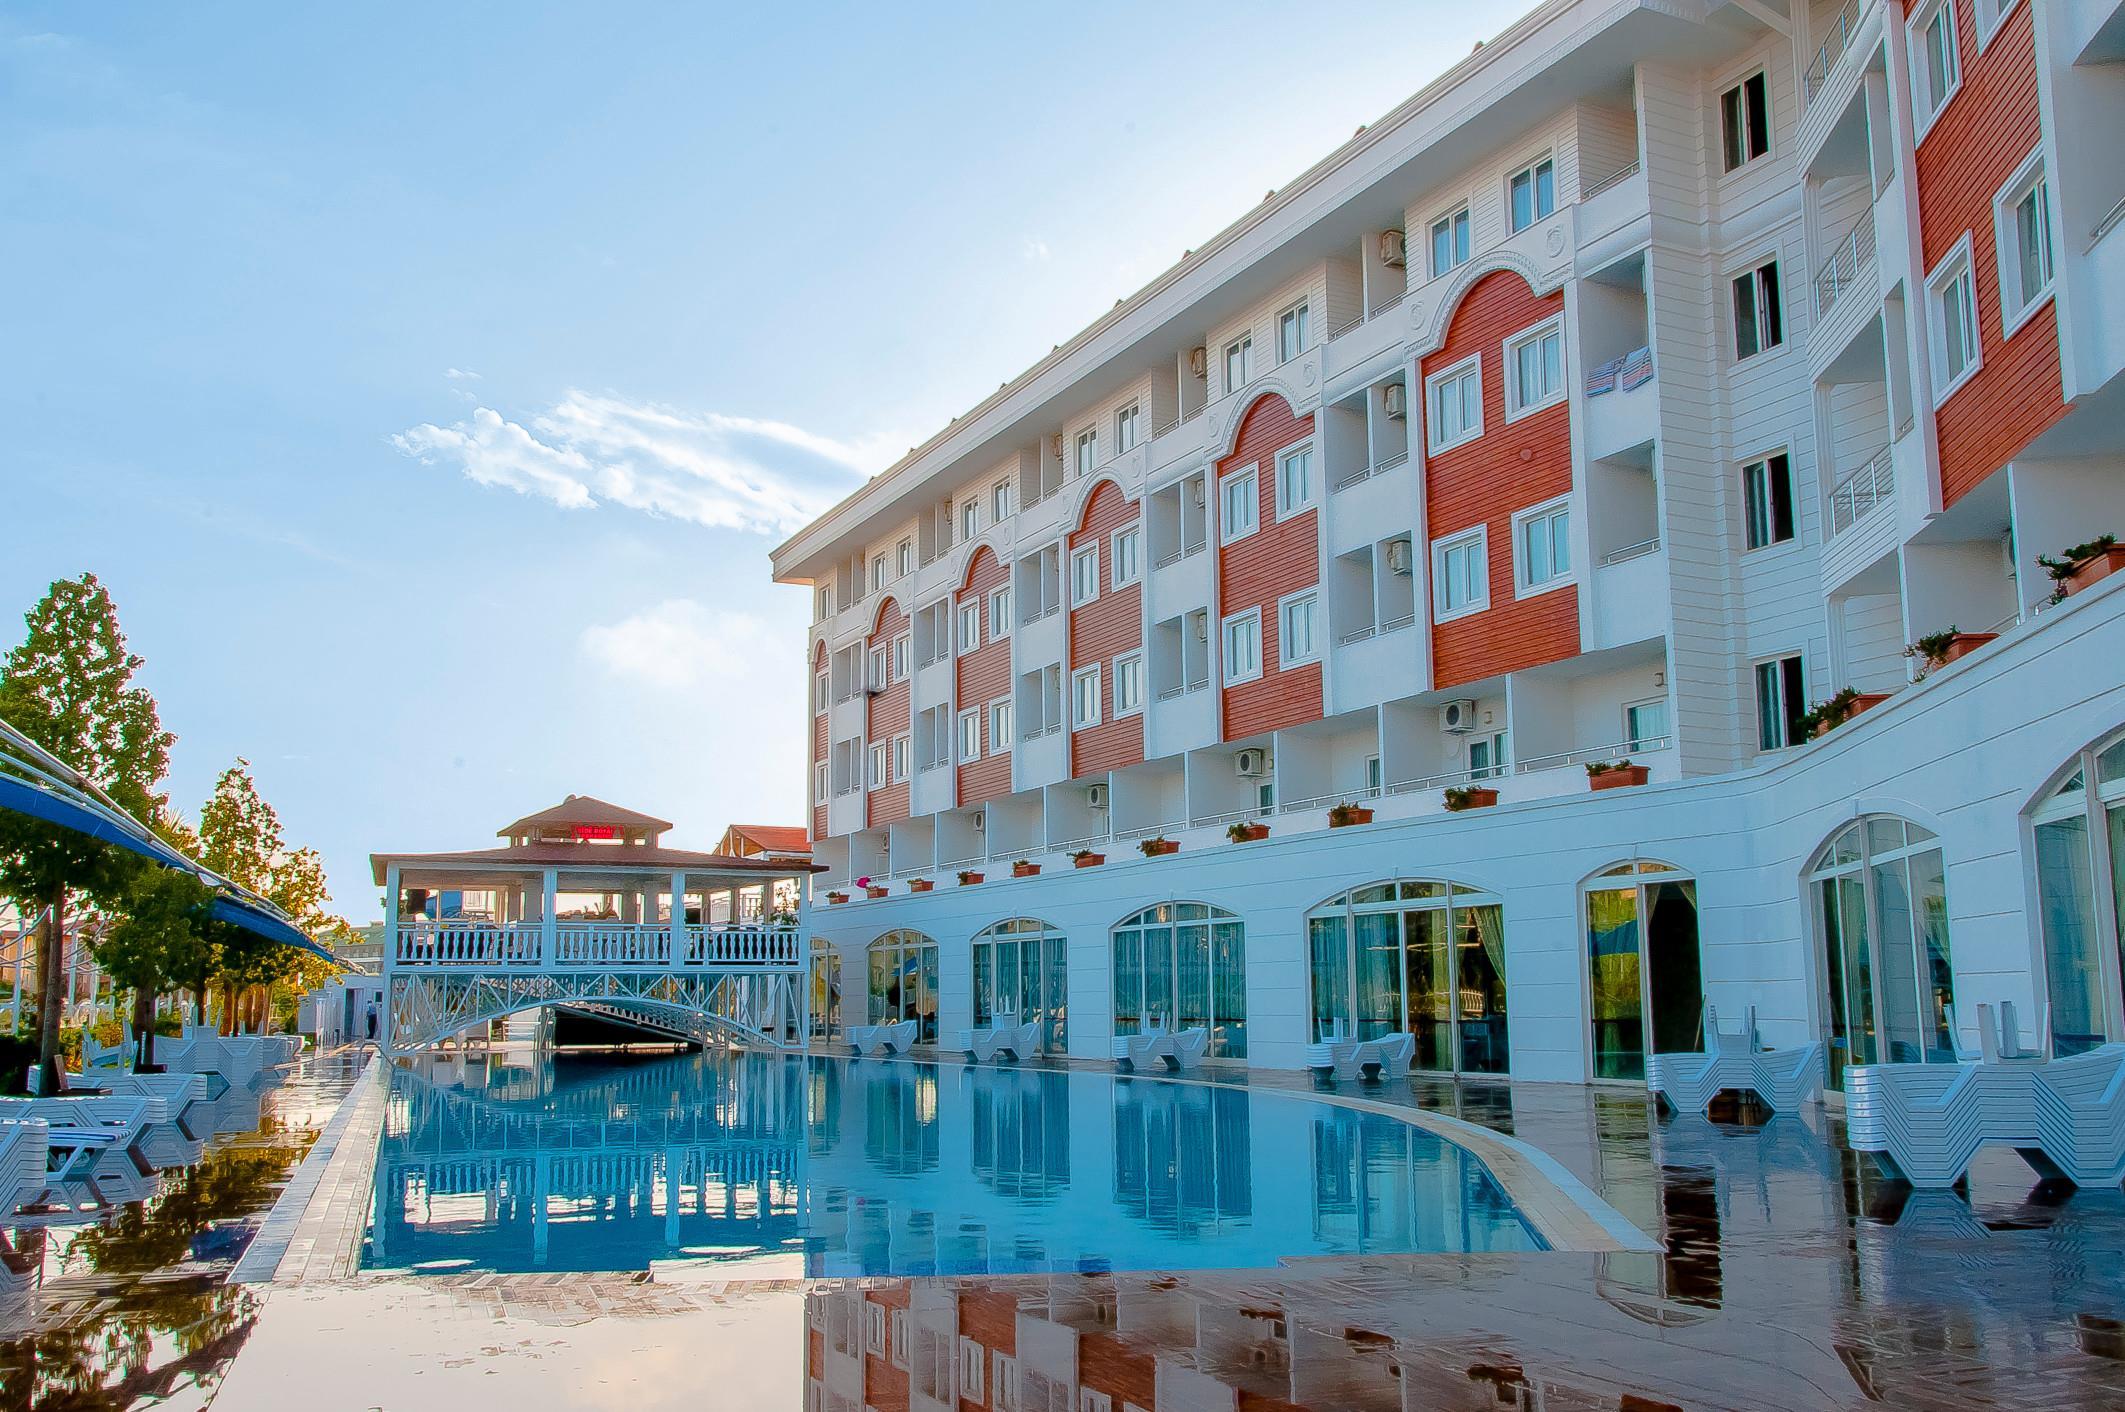 http://www.orextravel.sk/OREX/hotelphotos/side-royal-paradise-general-0019.jpg